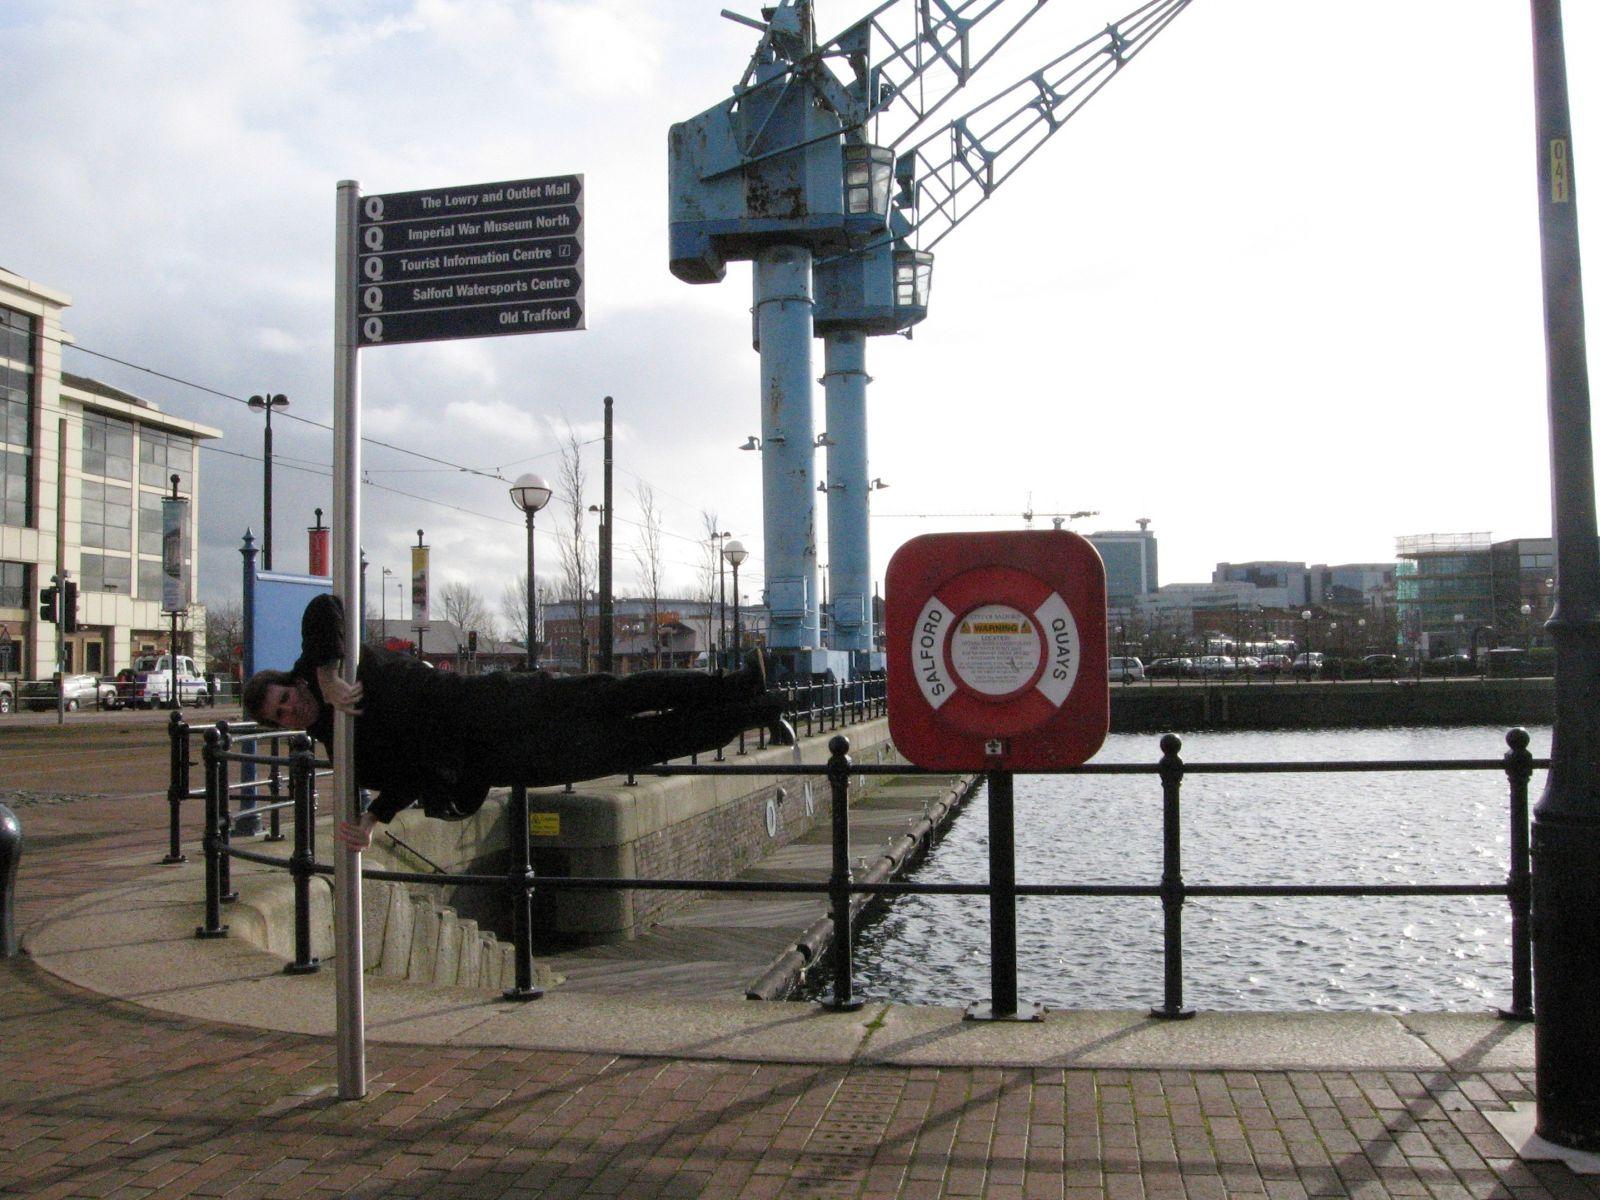 Salford Quays, UK 2006-2